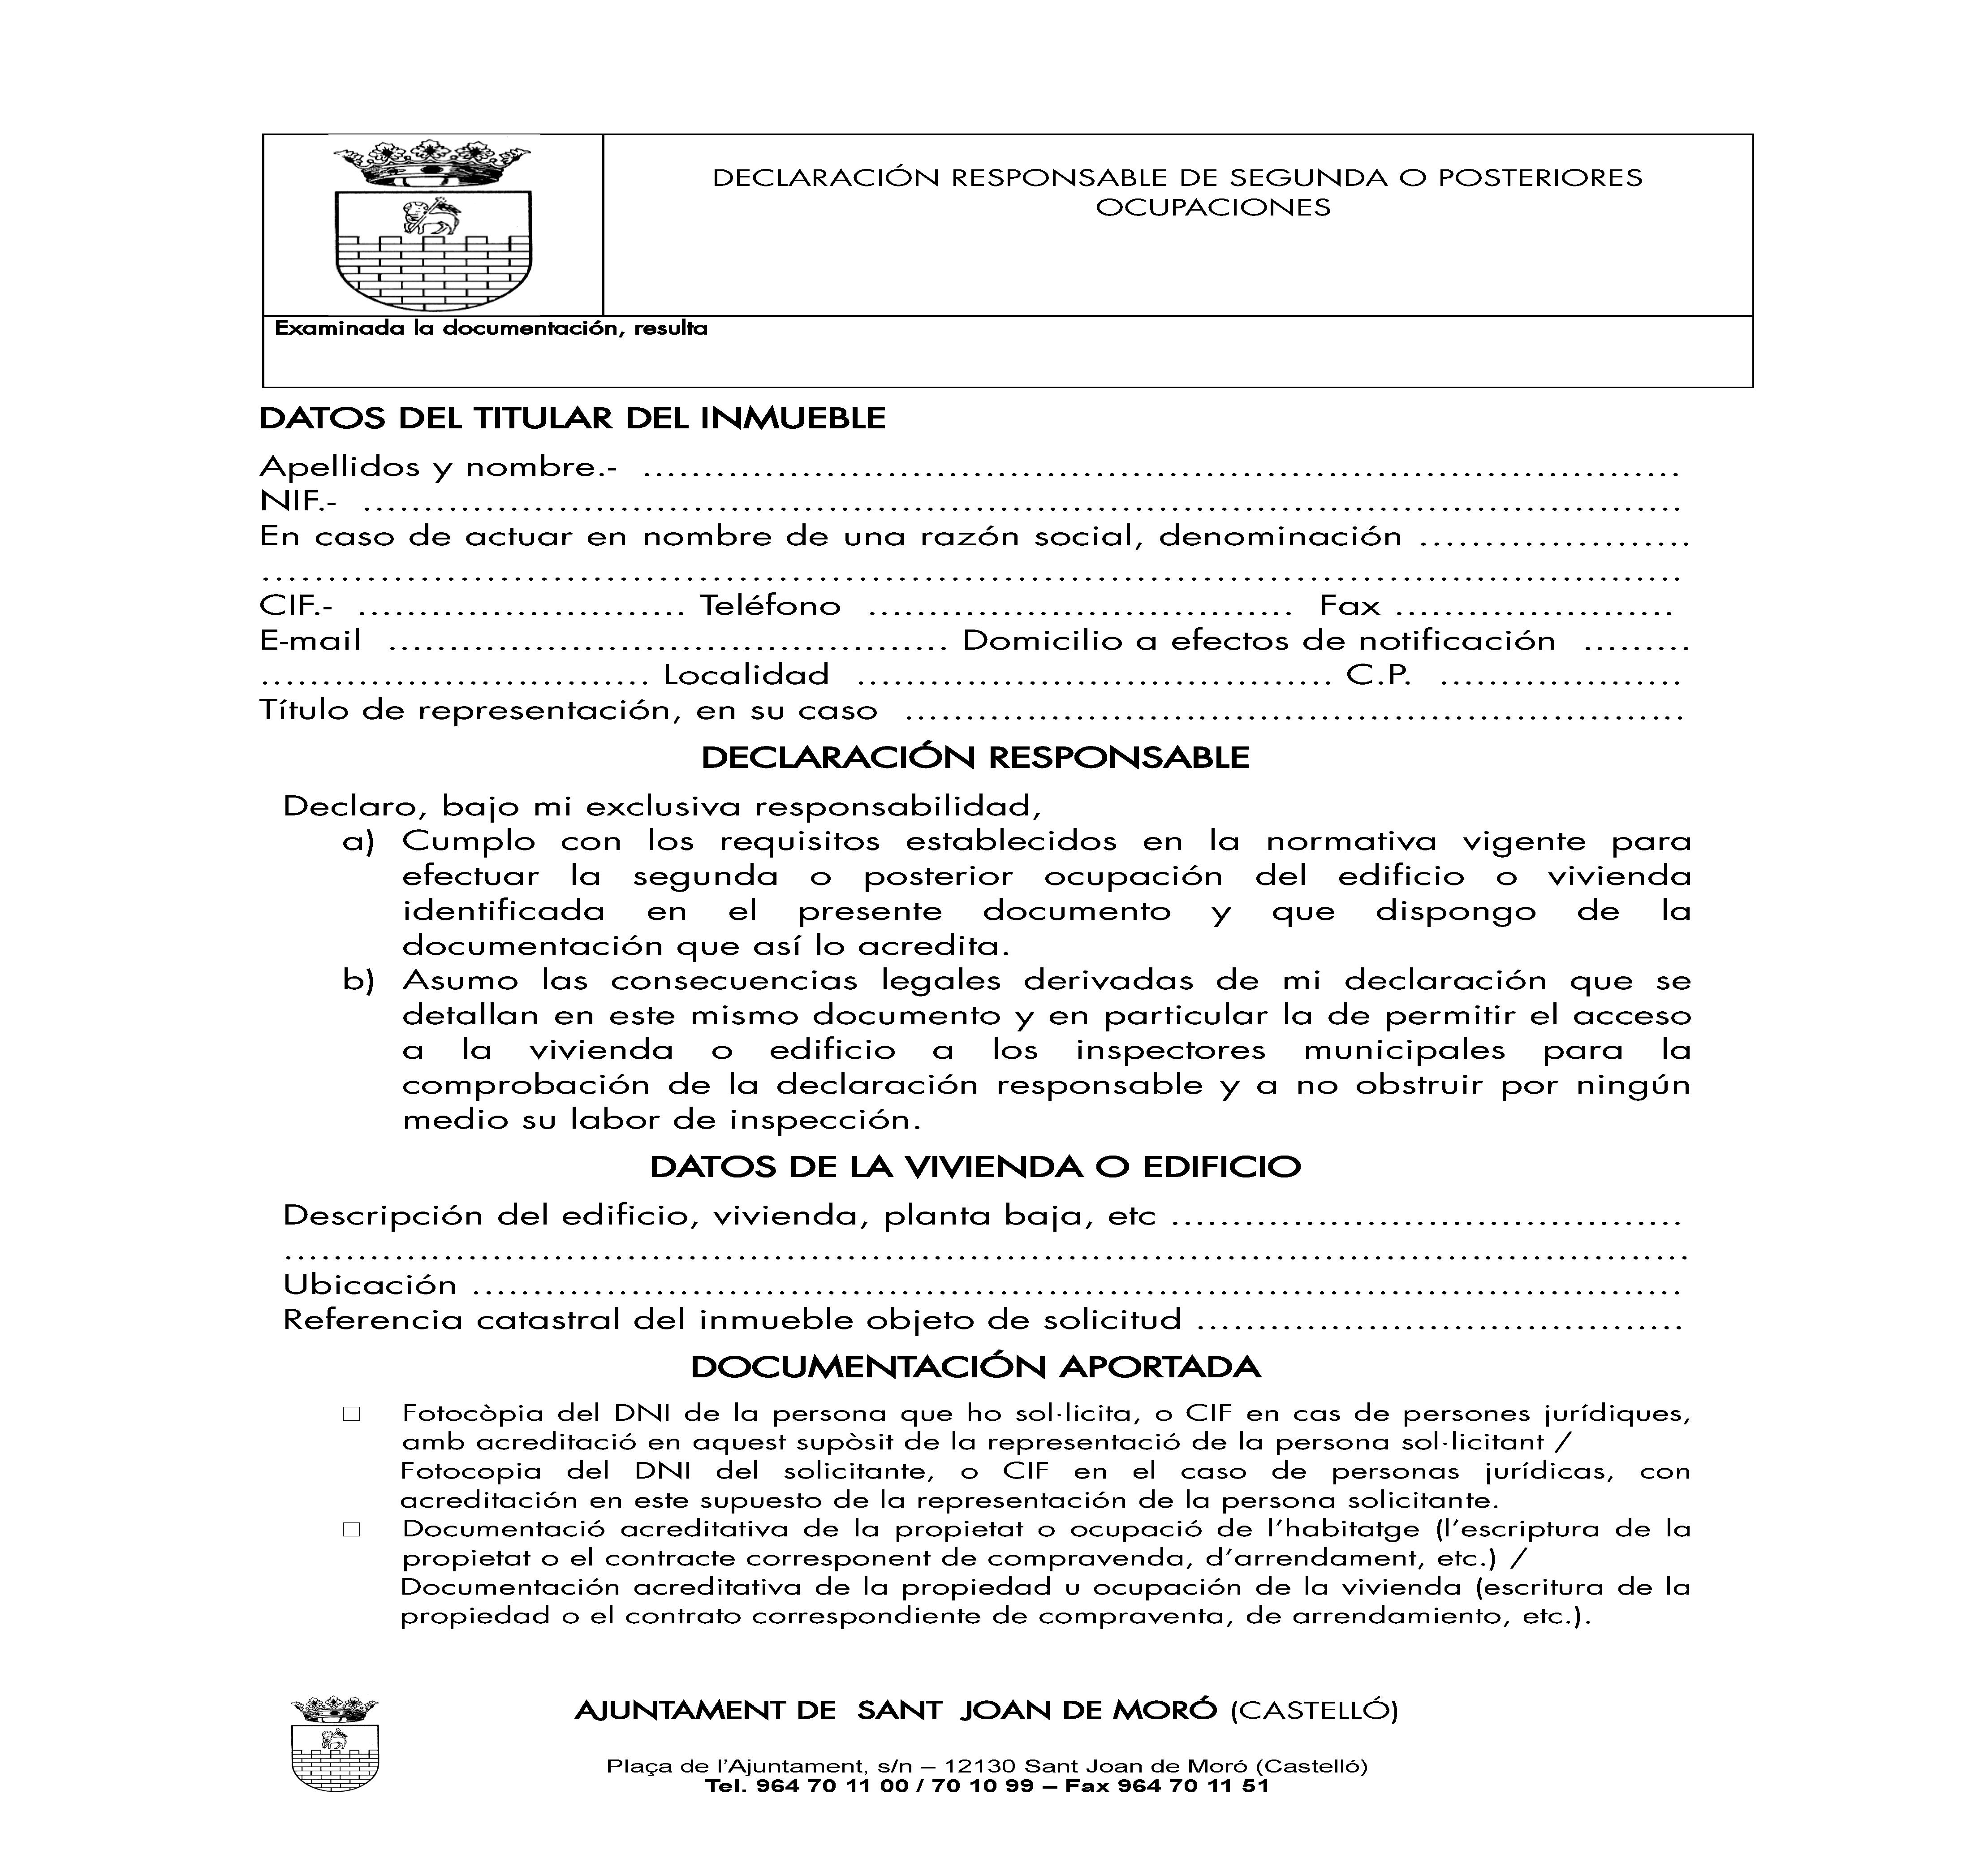 Impreso DECLARACIÓN RESPONSABLE SEGUNDA OCUPACION - San Joan de Moro_Página_1